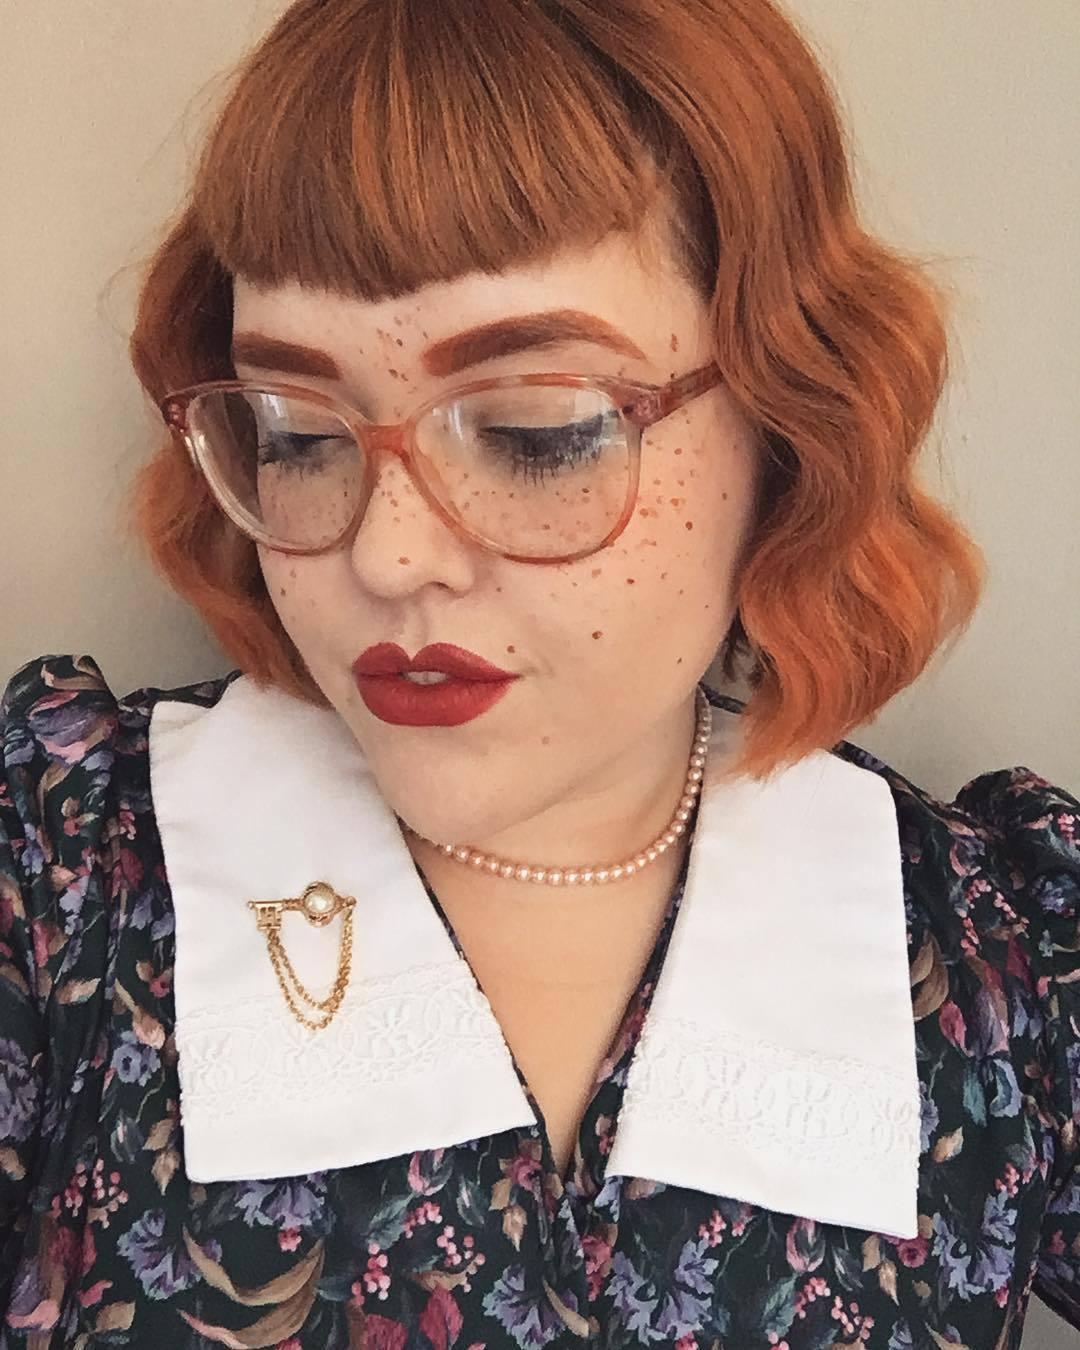 Femme au bob vintage court orange avec une frange en forme de V